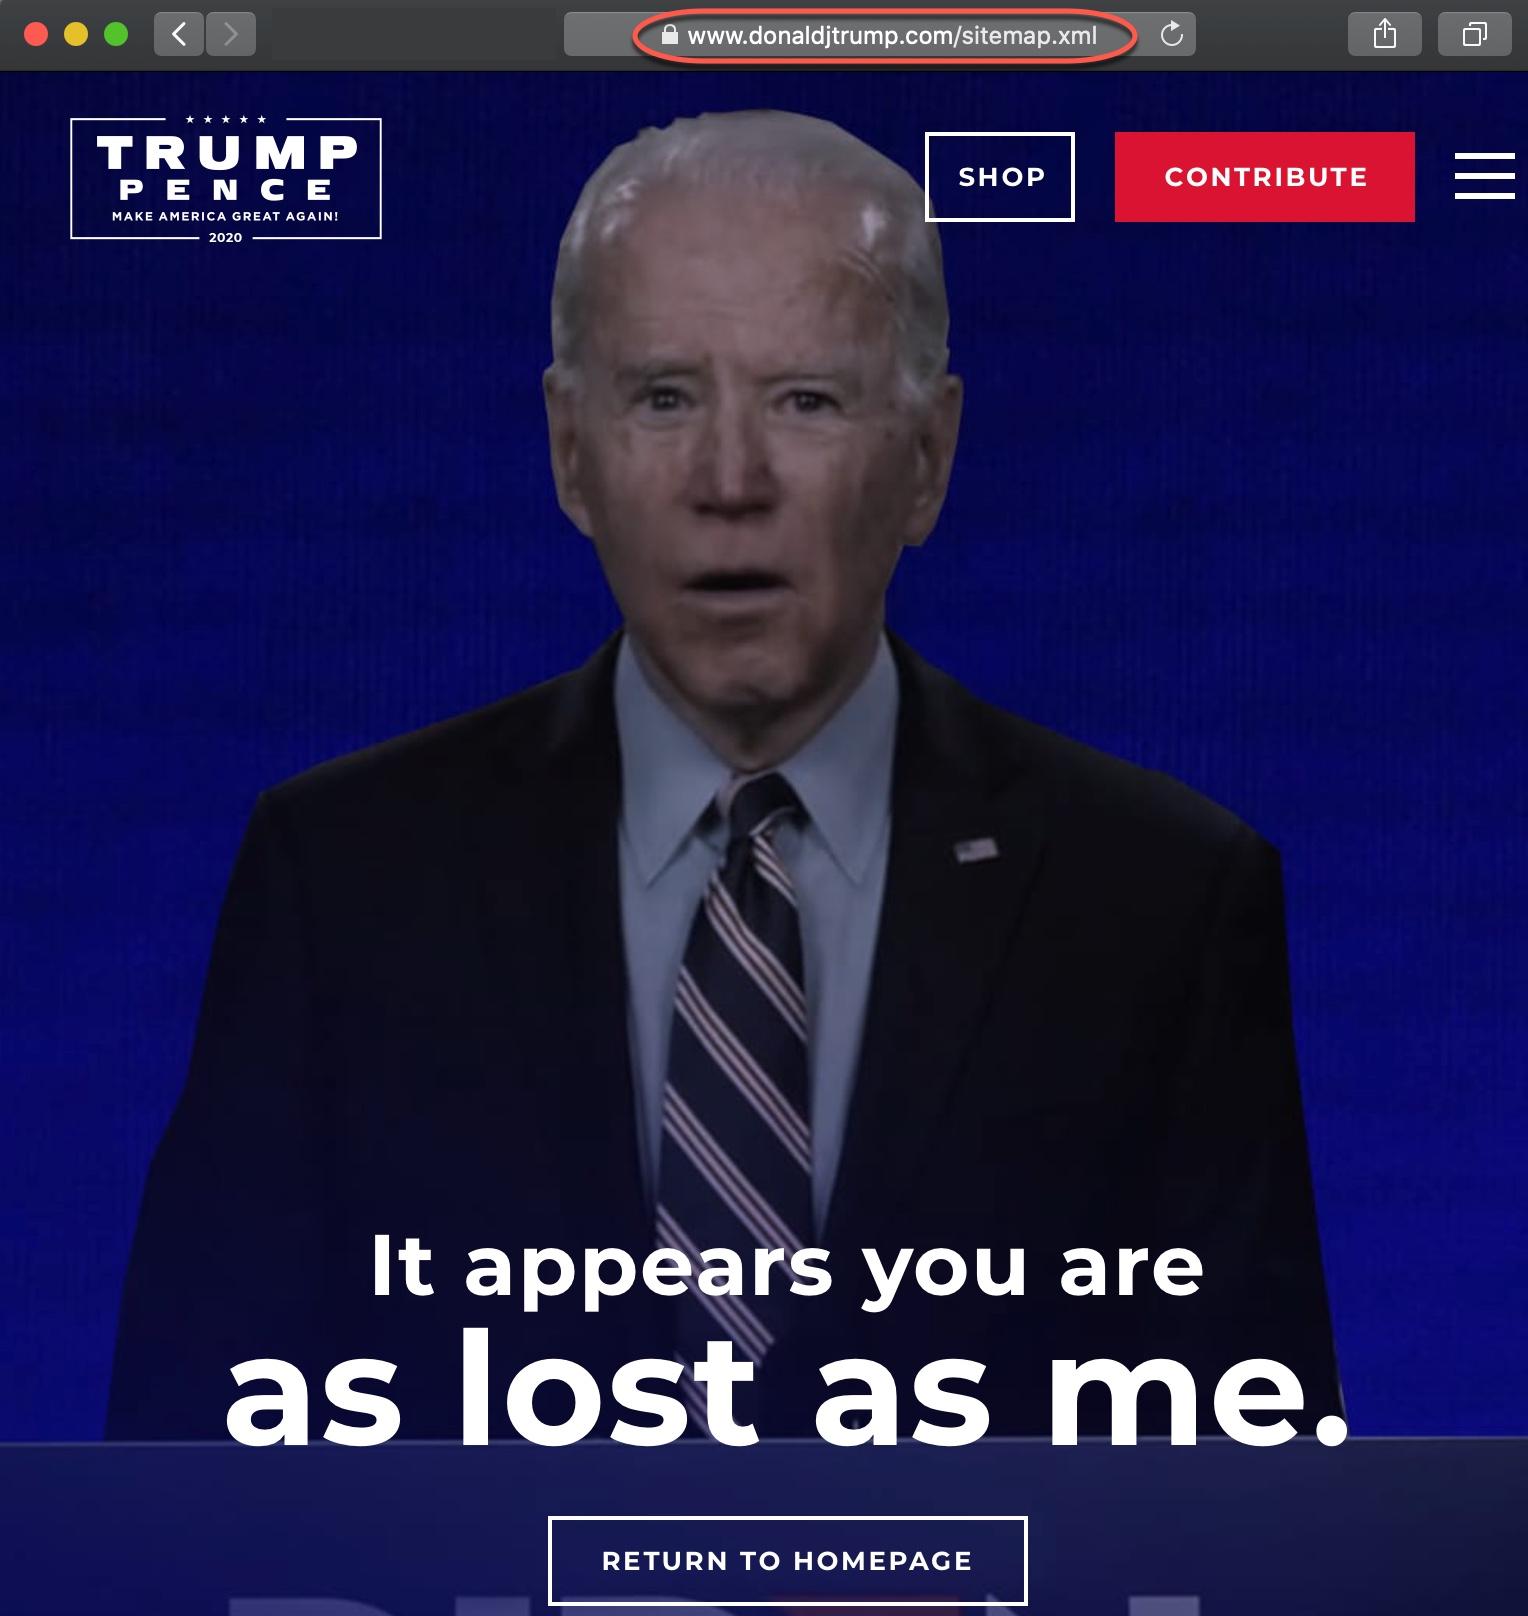 DonaldJTrump.com 404 Error Page